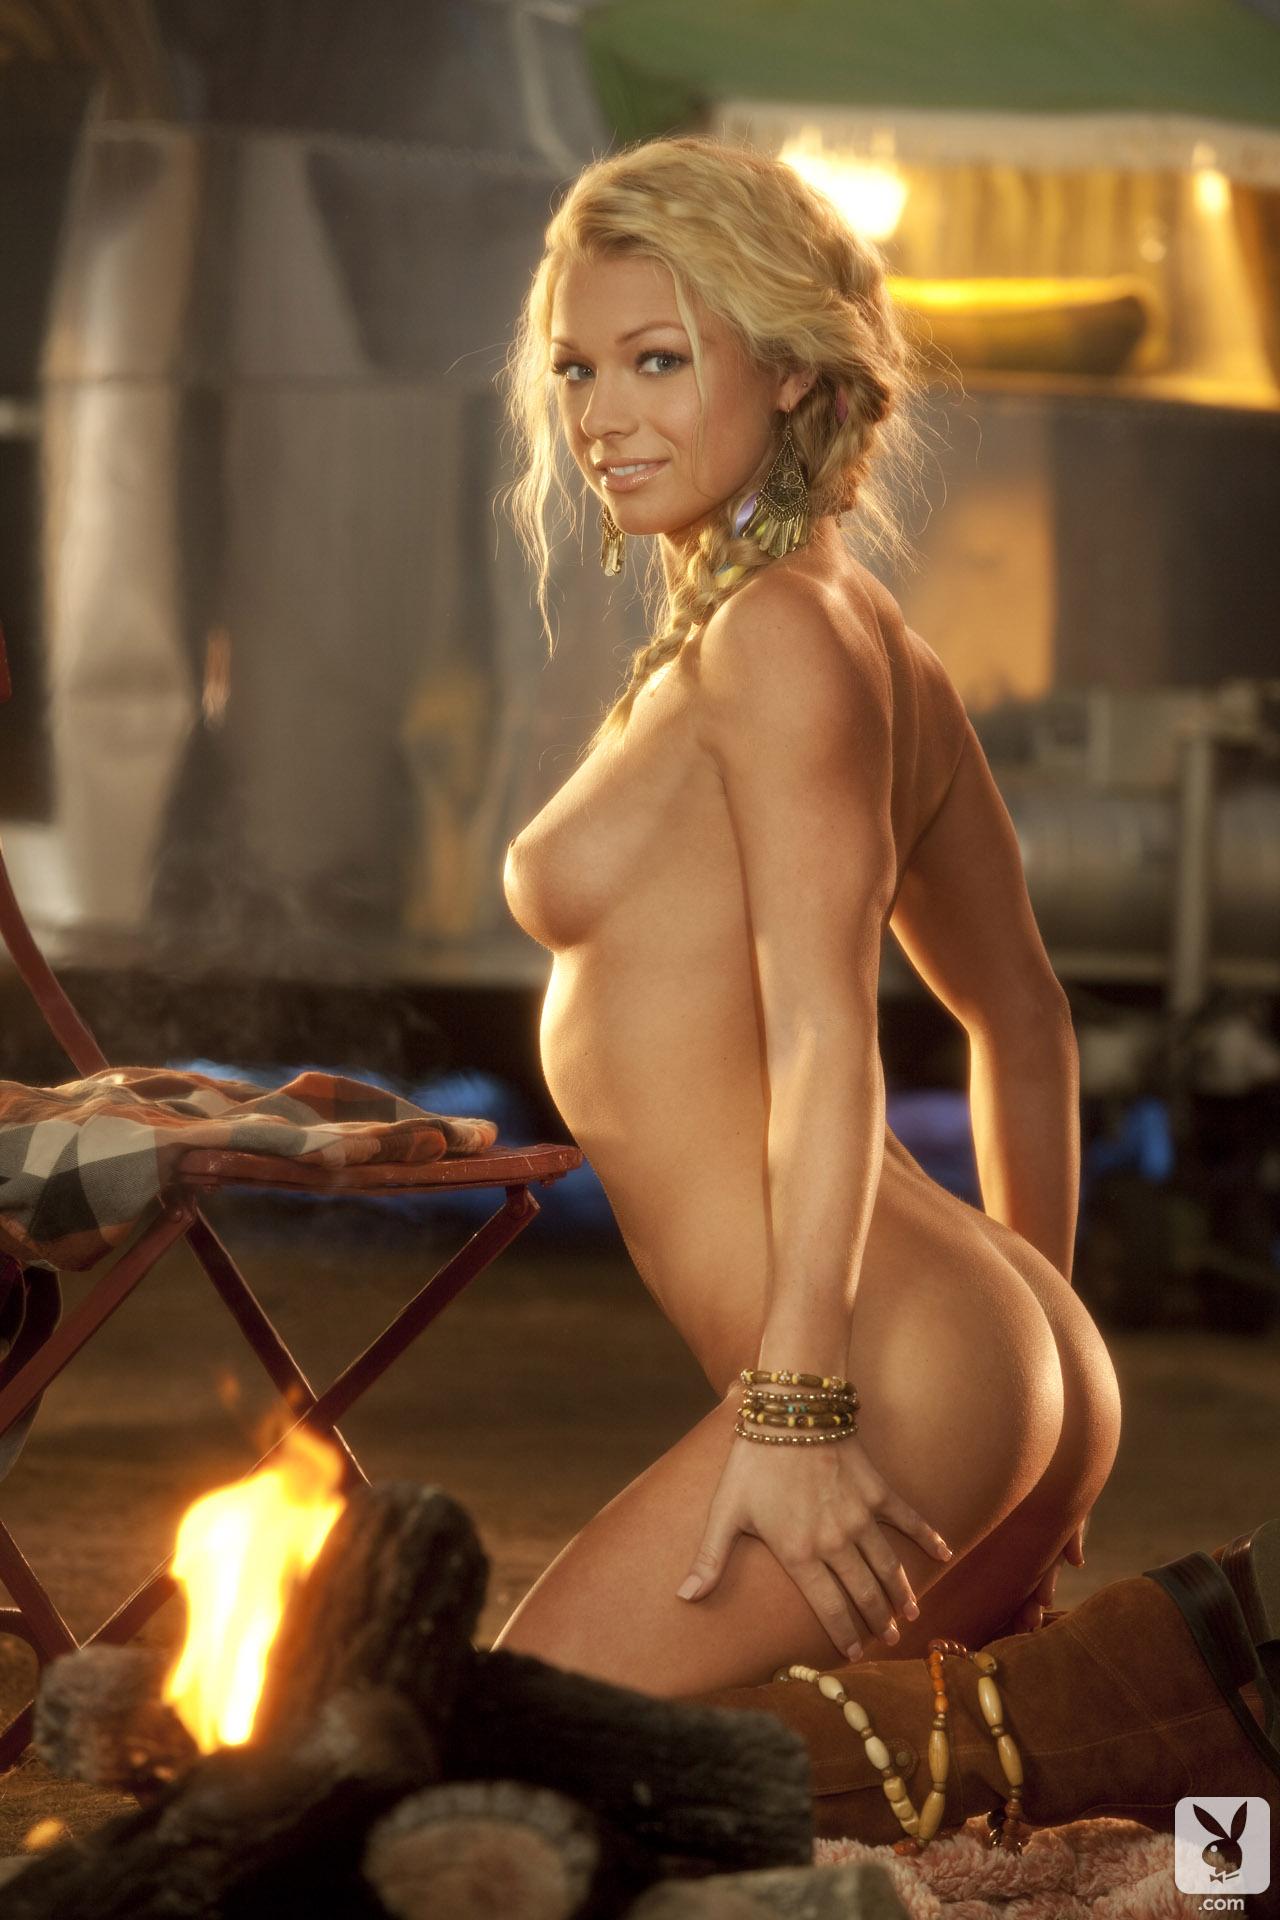 nikki Playboy may playmate leigh